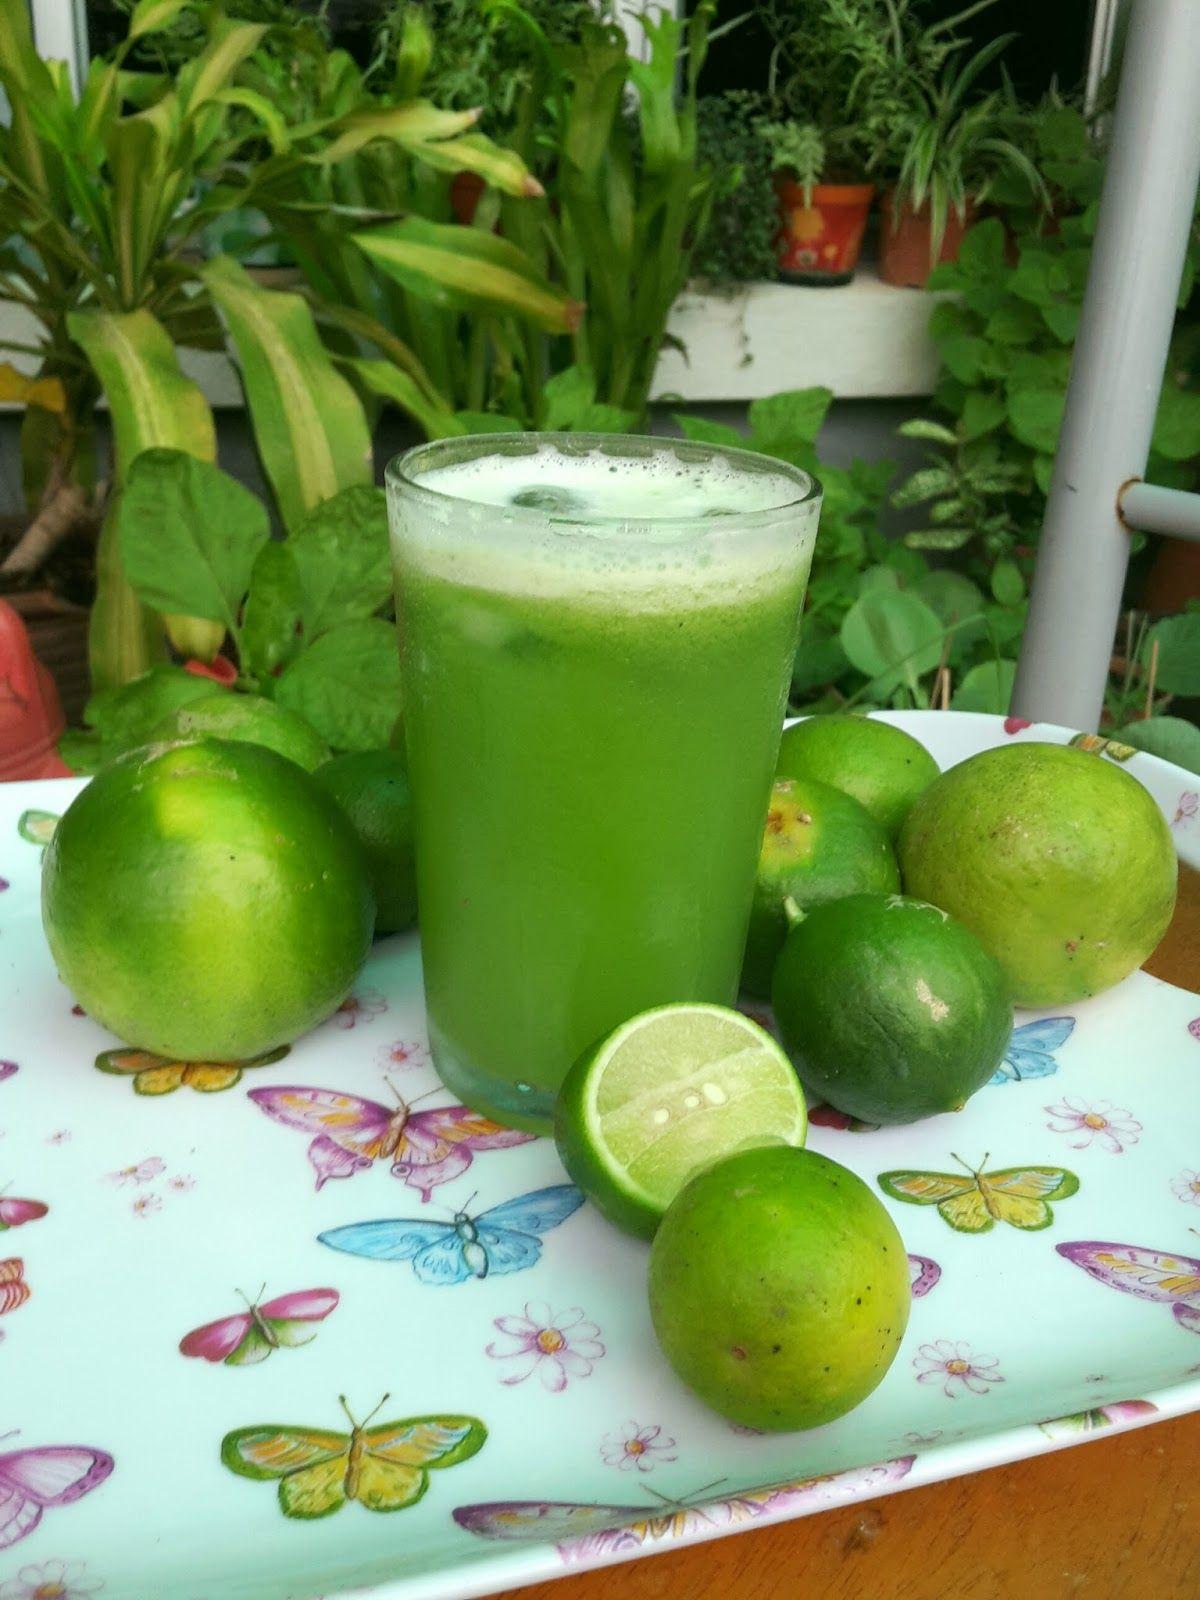 Bahan Bahanya 1 Batang Celery 1 Biji Peria Katak 1 Biji Epal Hijau 1 Hirisan Limau Nipis Cara Caranya Bersihkan Sayur Sayur Limau Minuman Sehat Sayuran